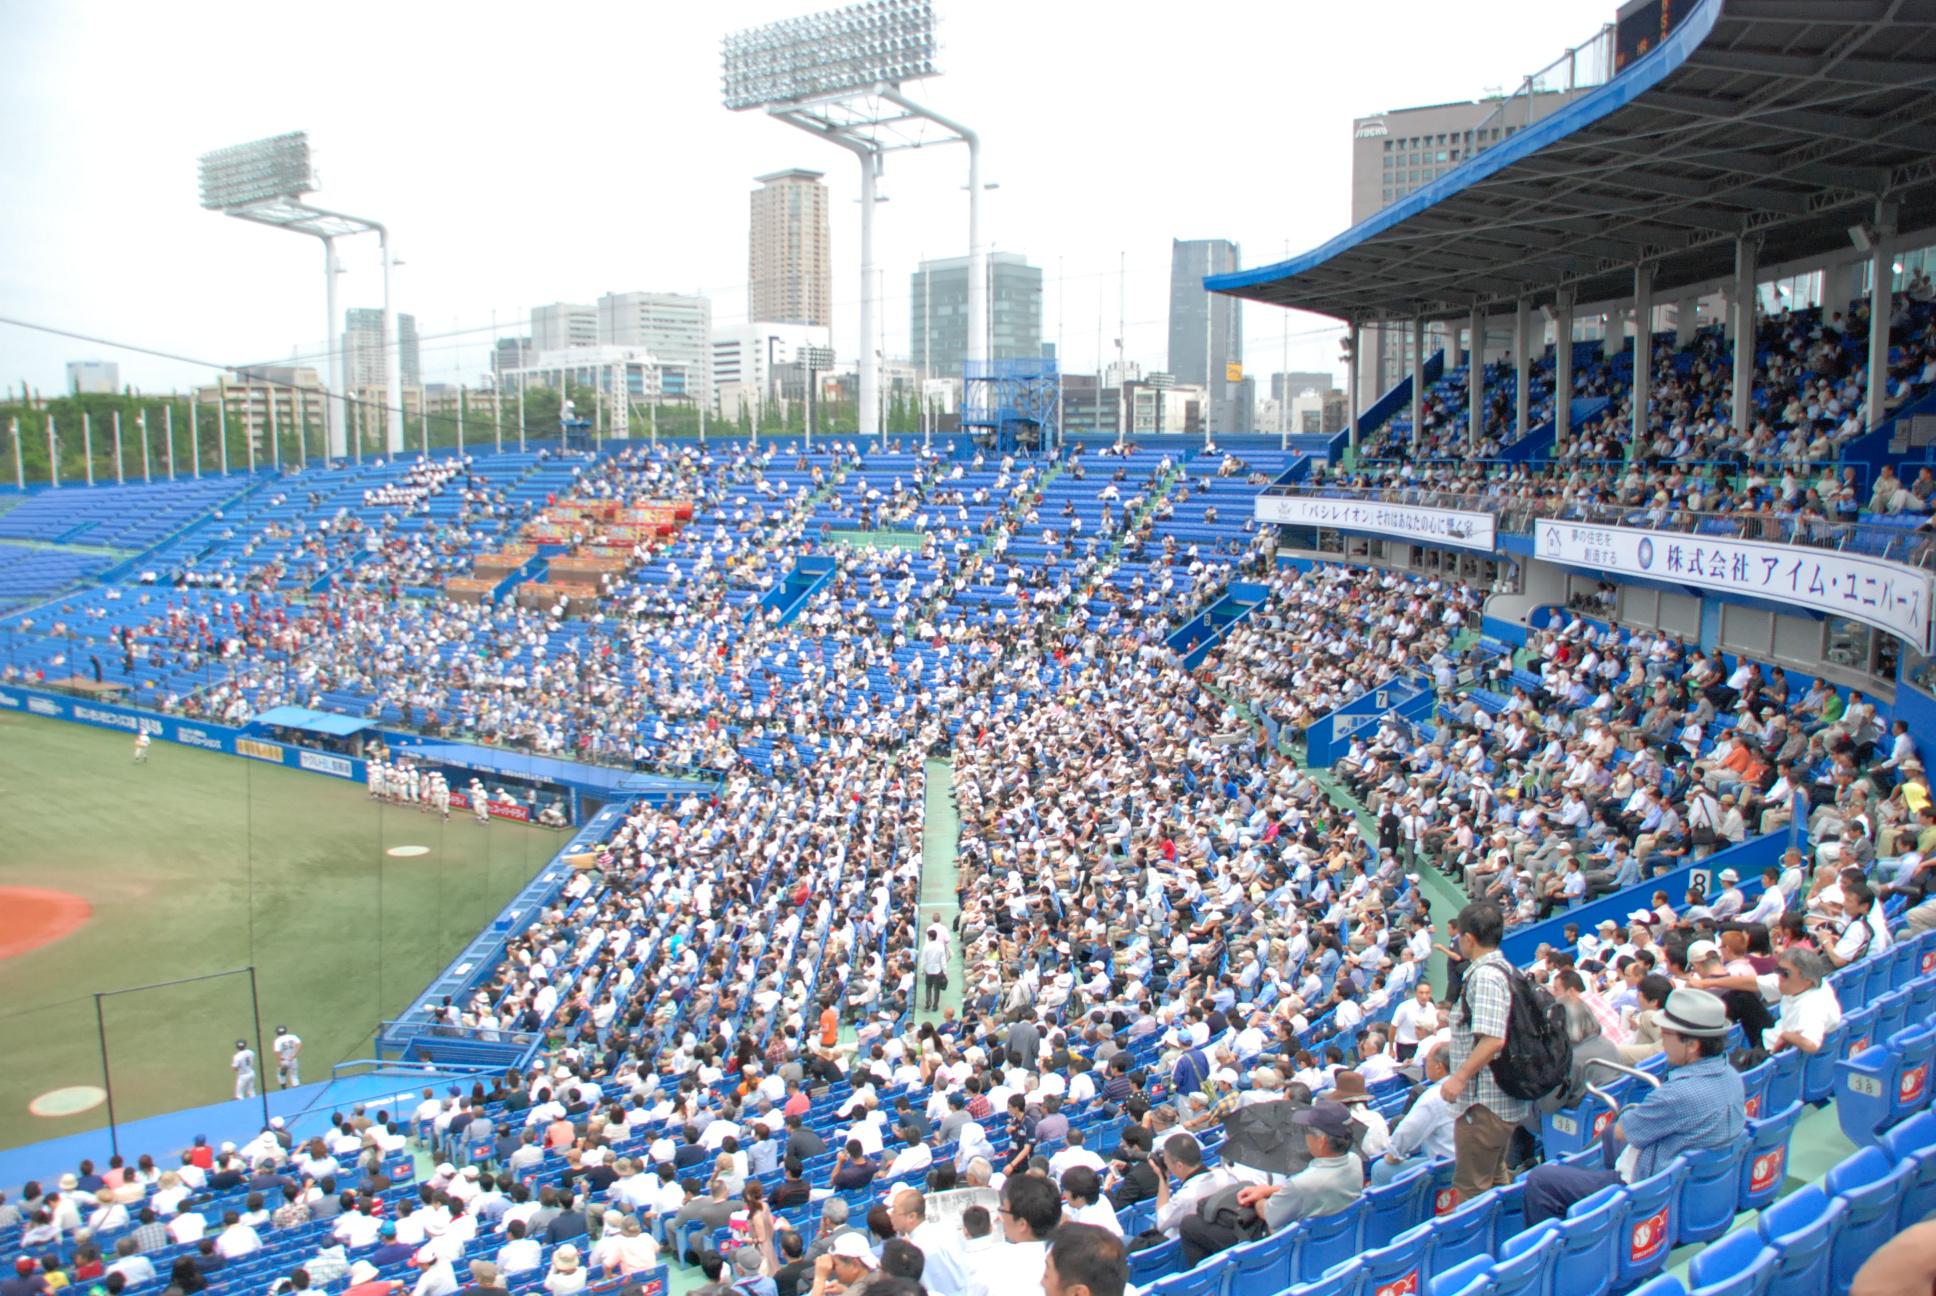 日本陸上競技選手権大会 - Japan Championships in Athletics - JapaneseClass.jp